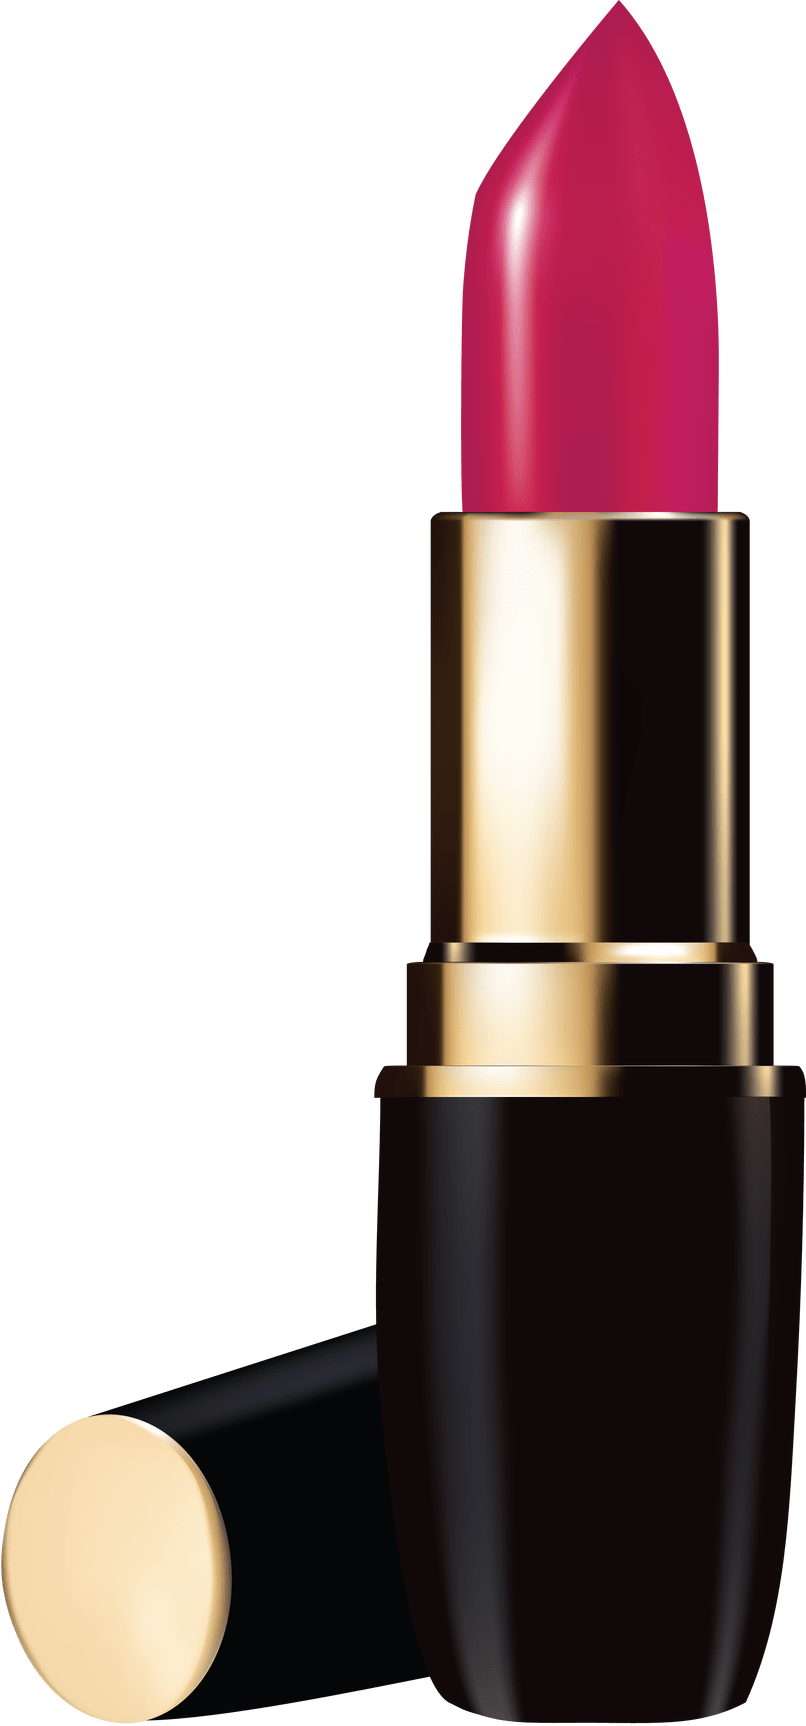 lipstick clipart gambar